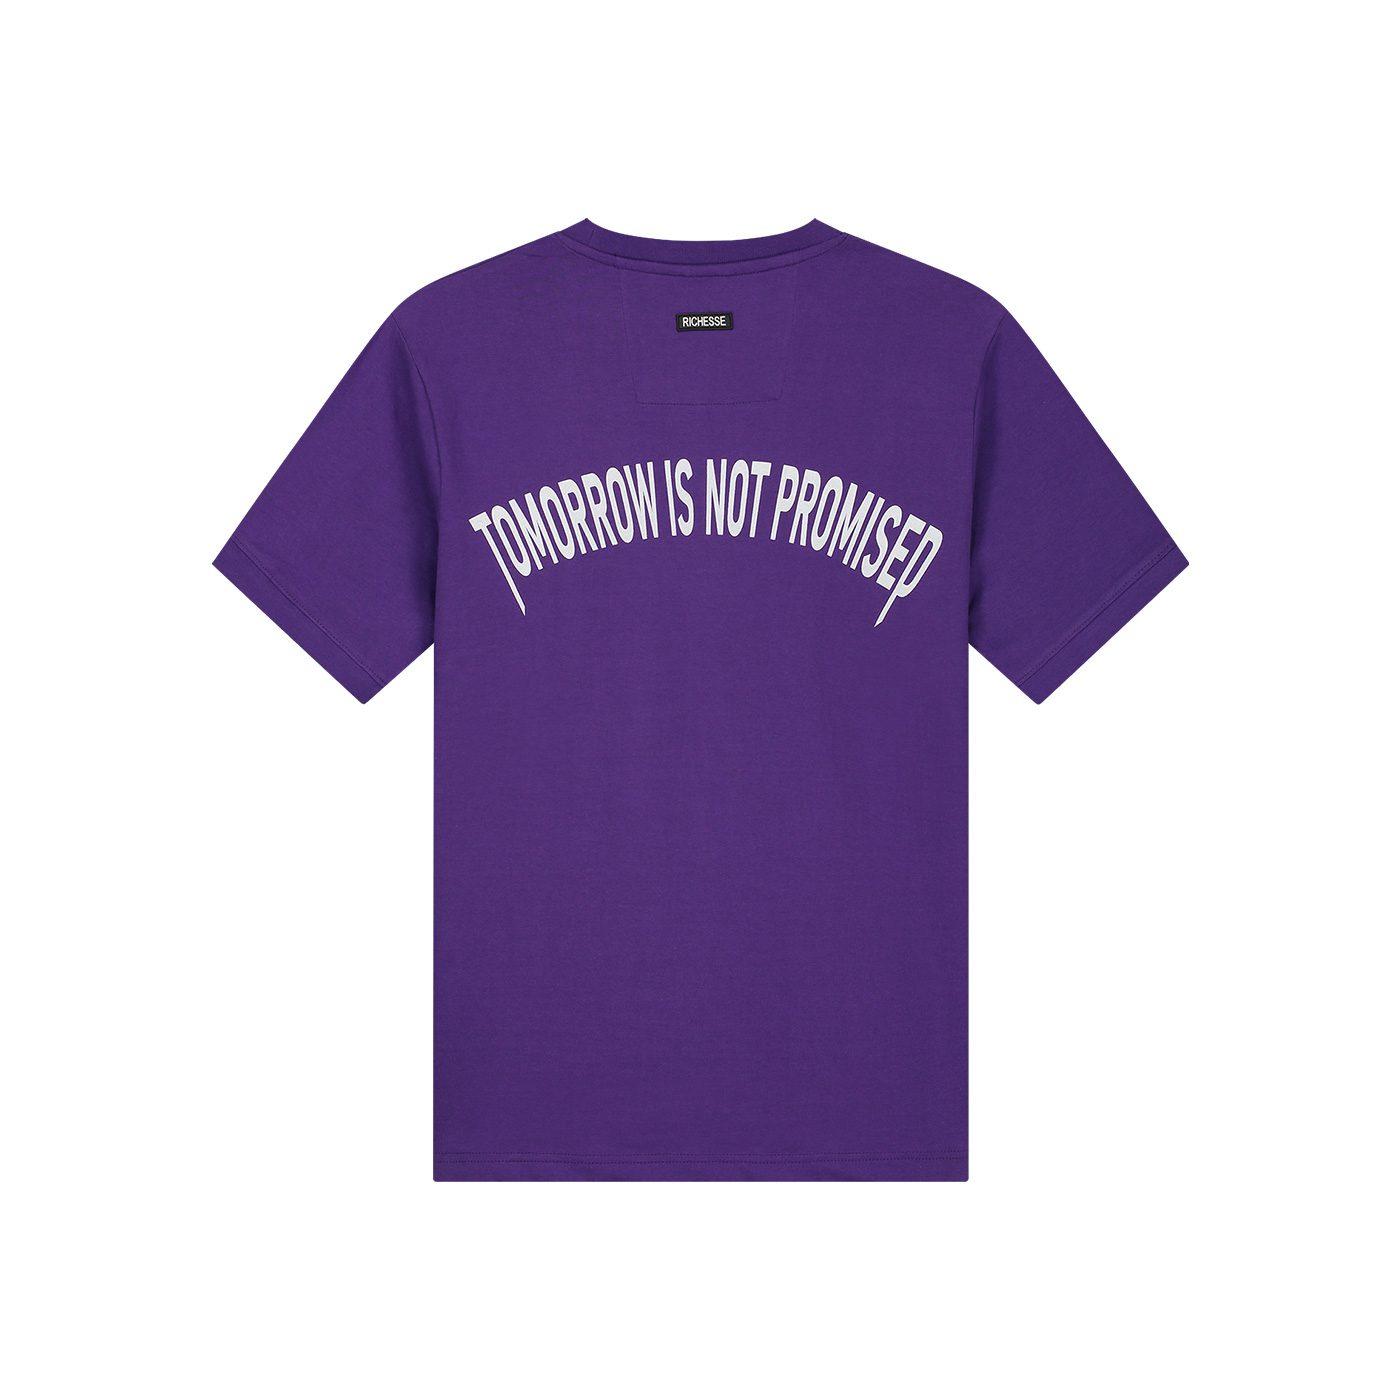 Promised-Purple-T-shirt-Back